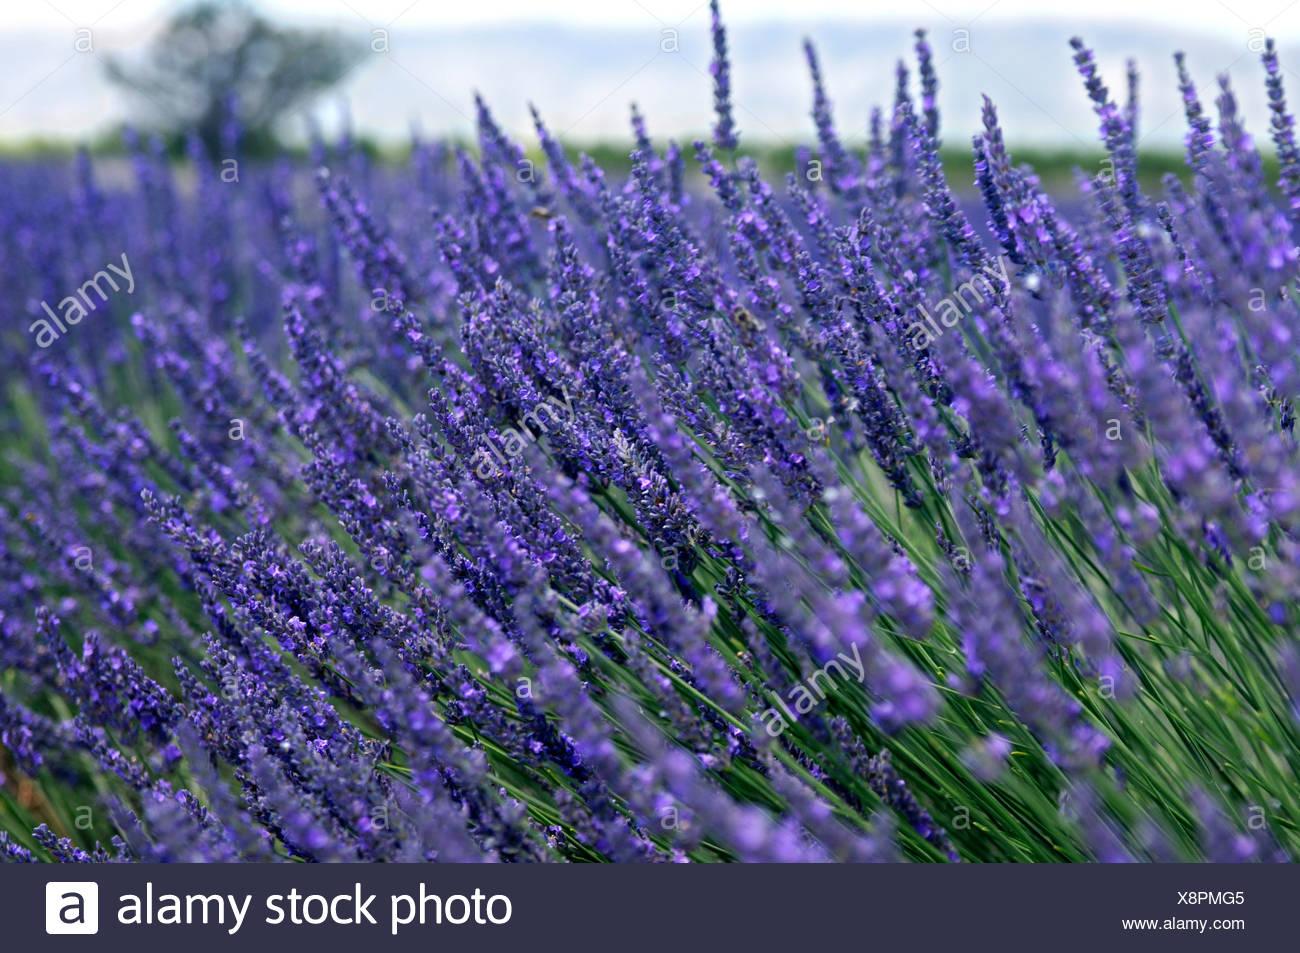 Lavender field, Plateau de Valensole, Provence, France, Europe - Stock Image